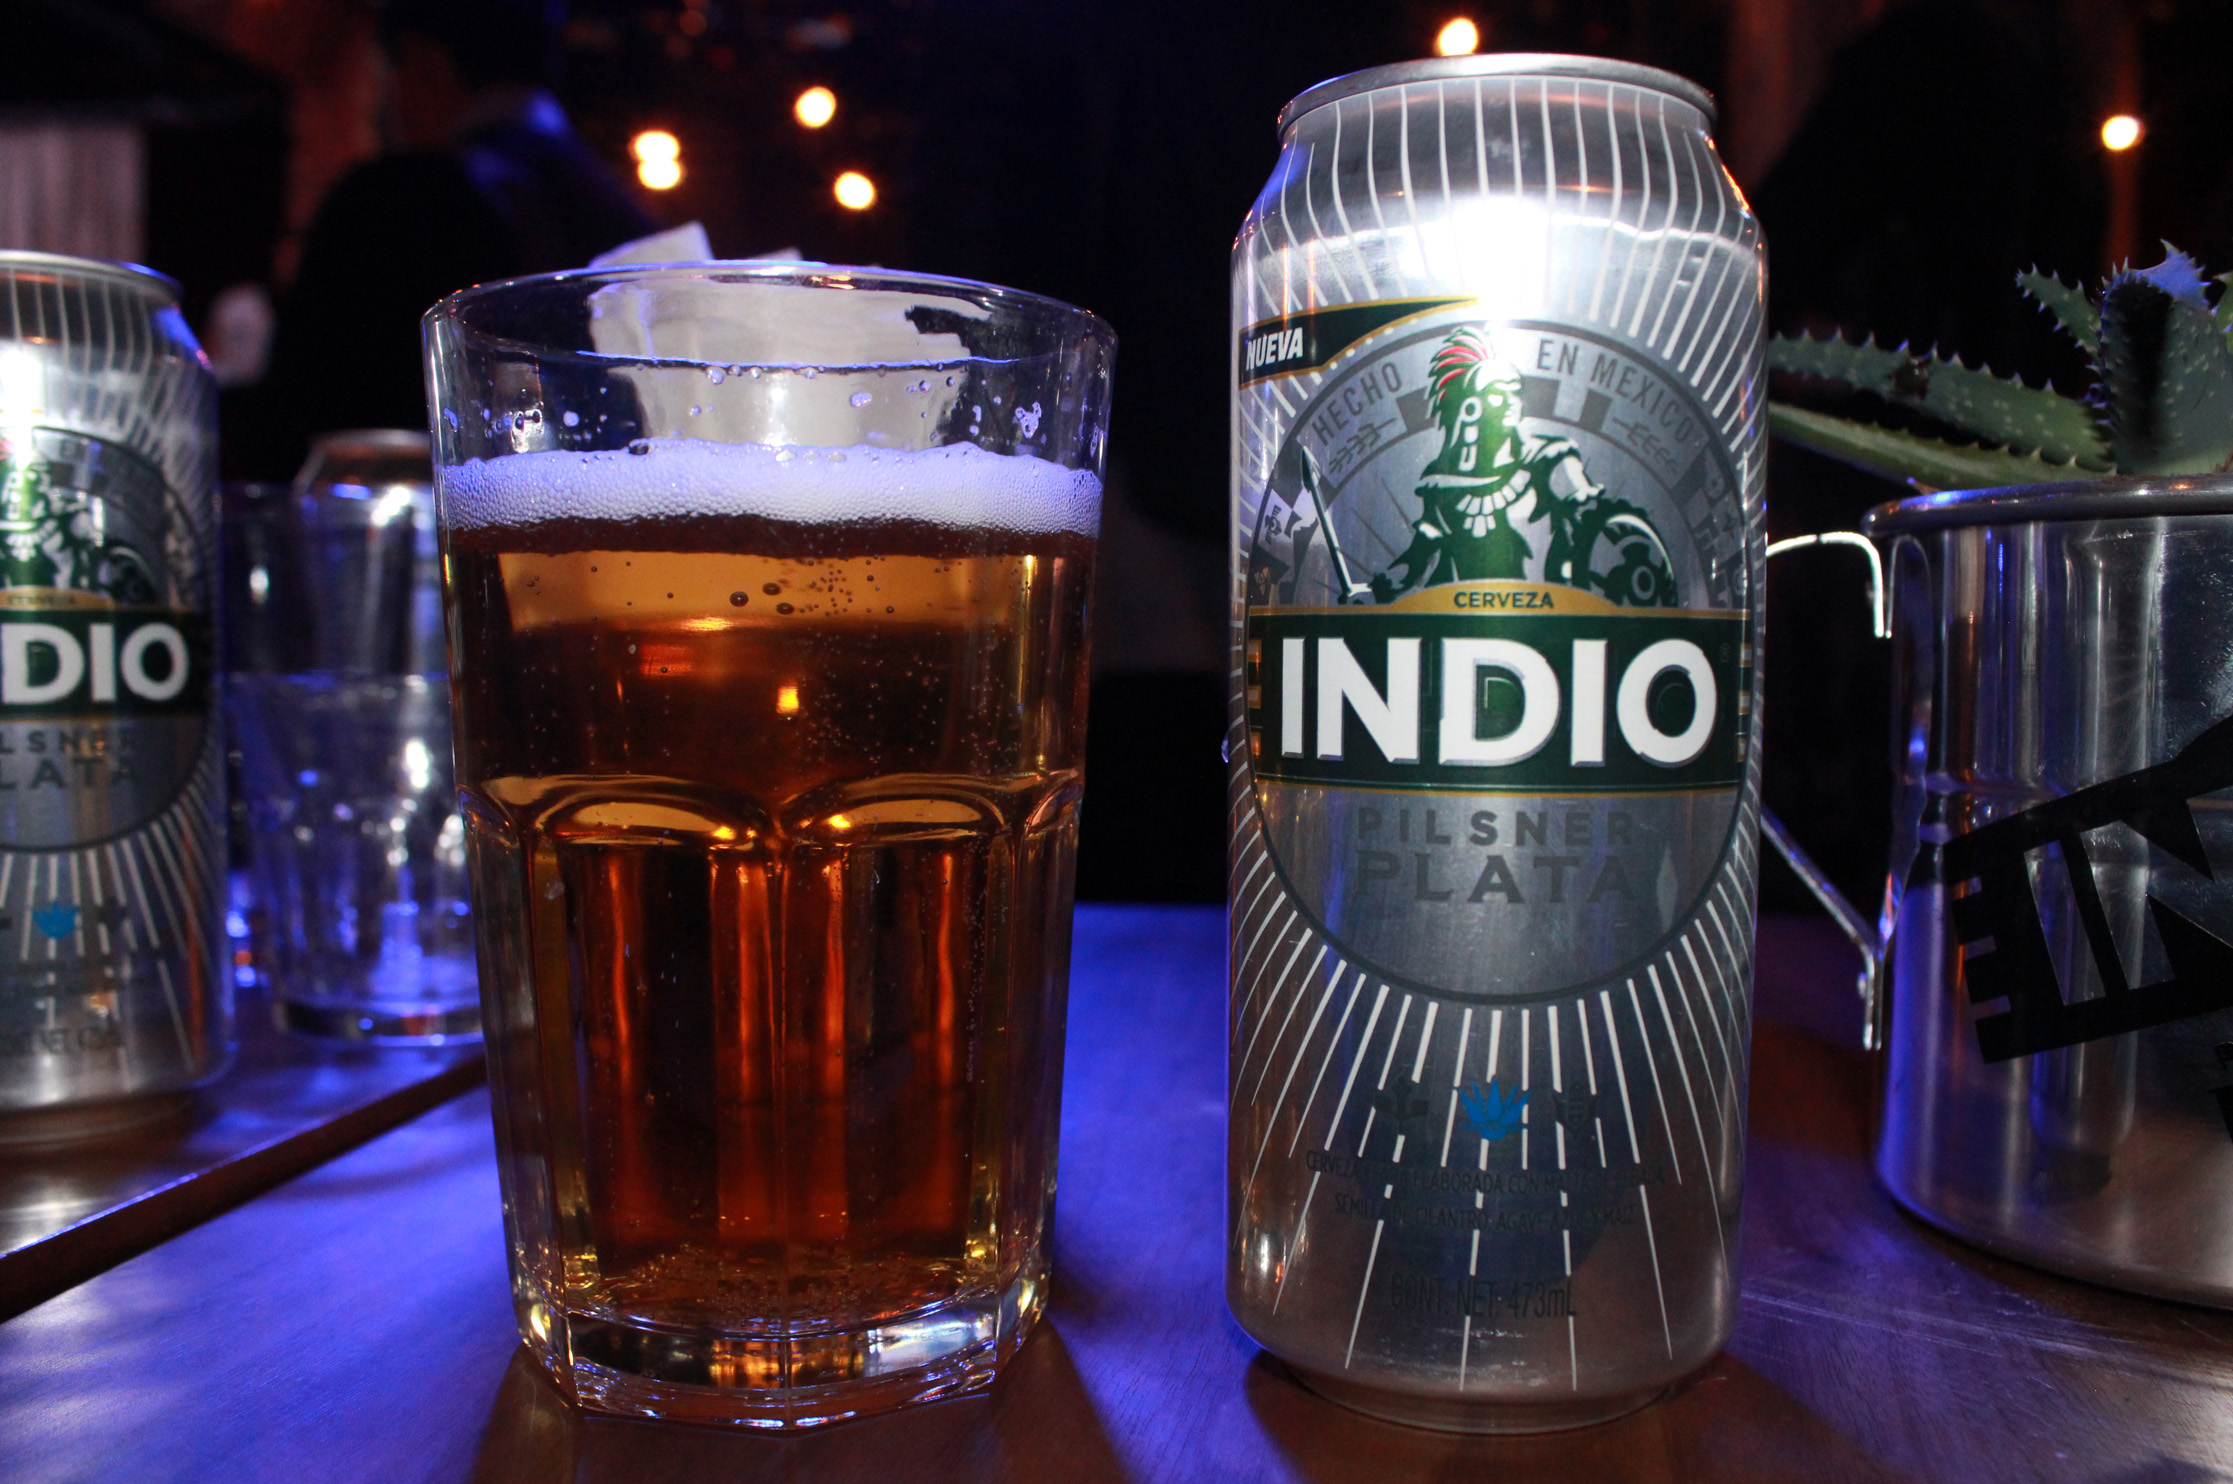 http://cervecerosdemexico.com/wp-content/uploads/2017/06/Indio-Pilsner-Plata.jpg